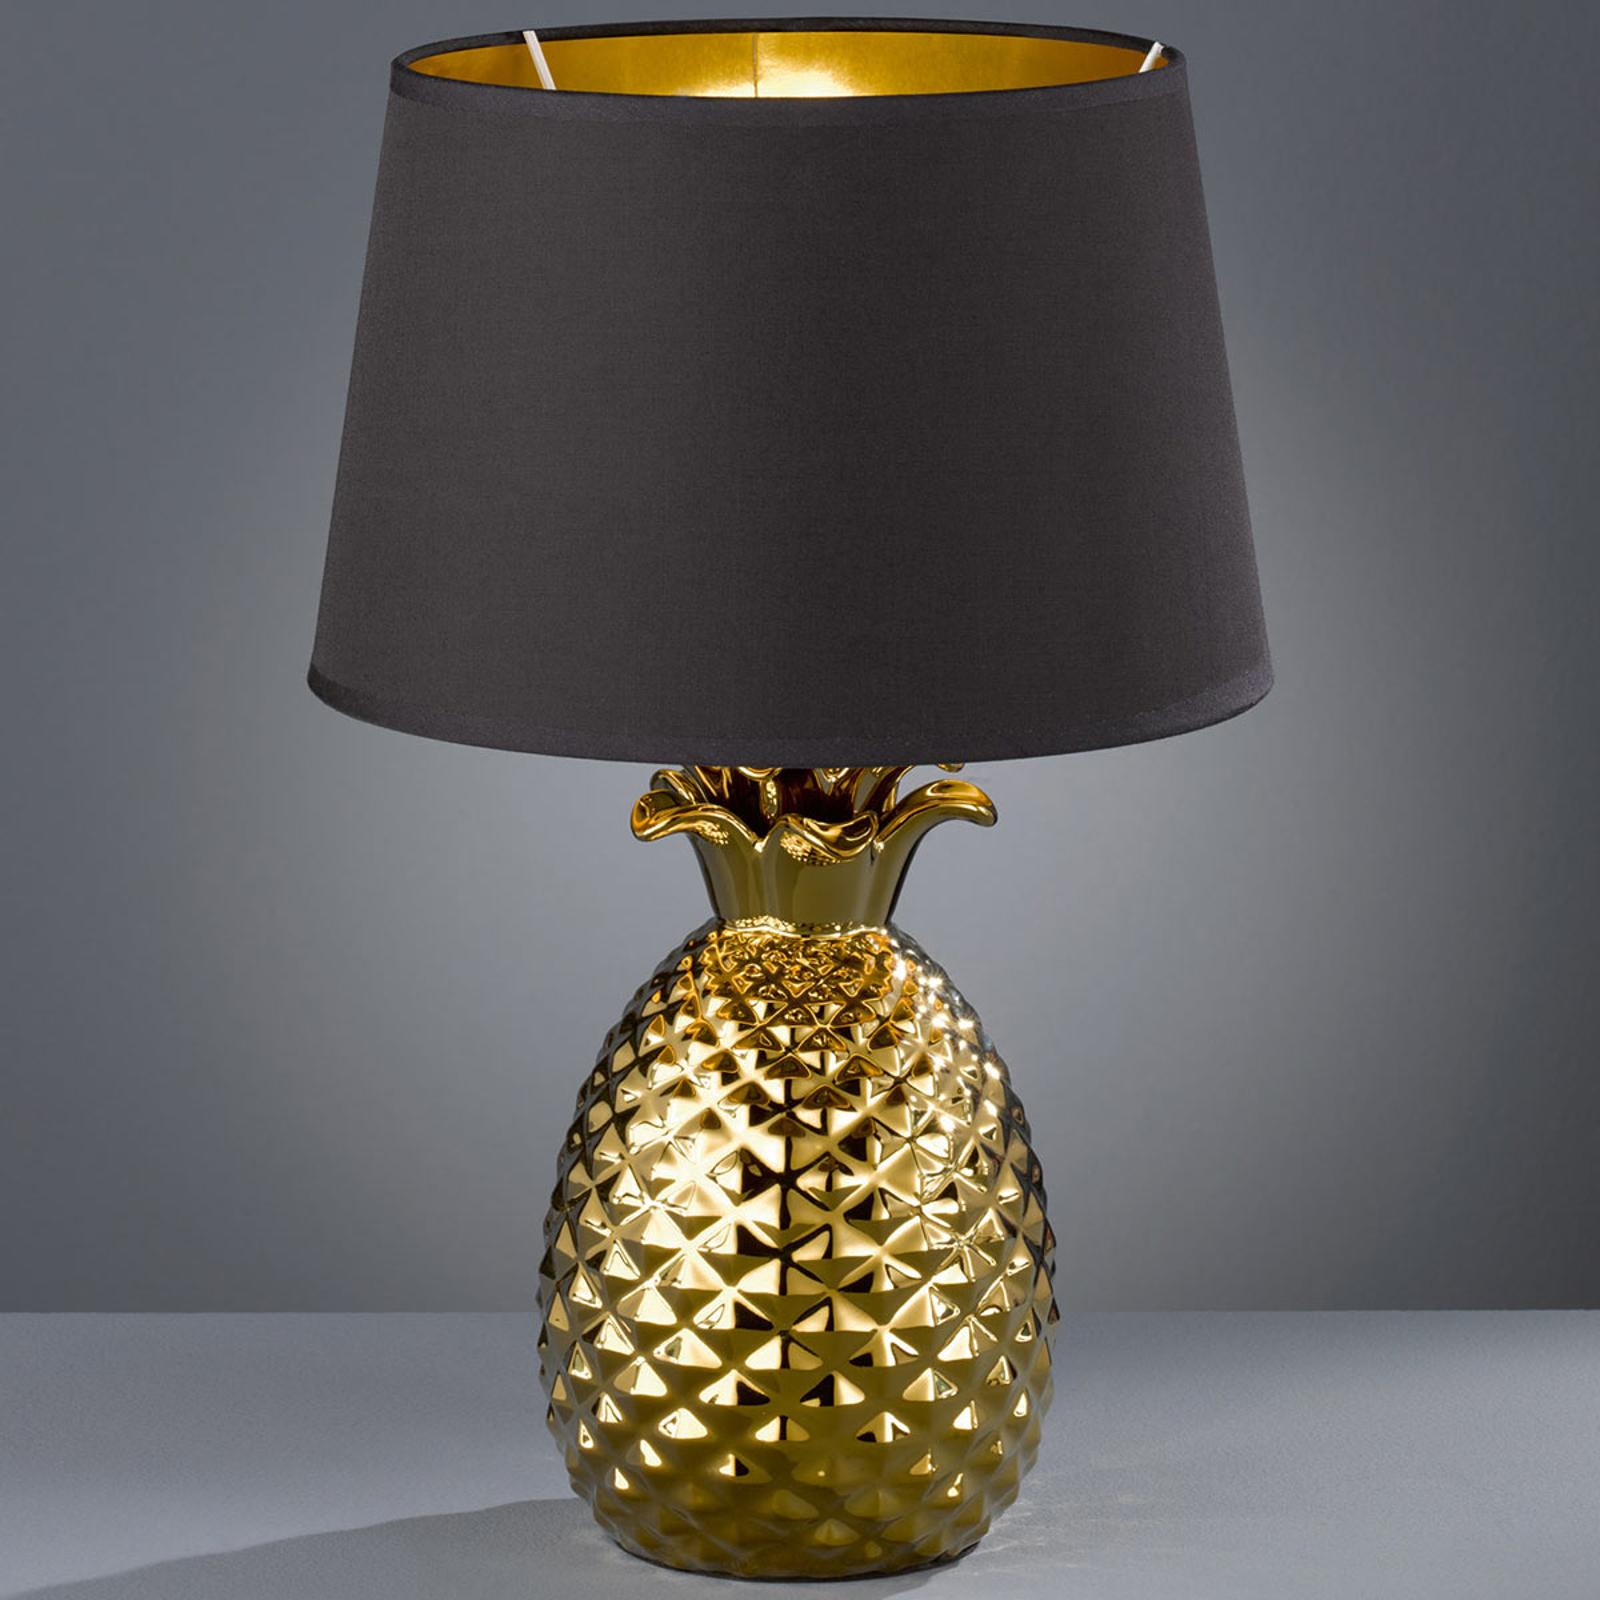 Goud-zwarte textiel tafellamp Pineapple, 45 cm